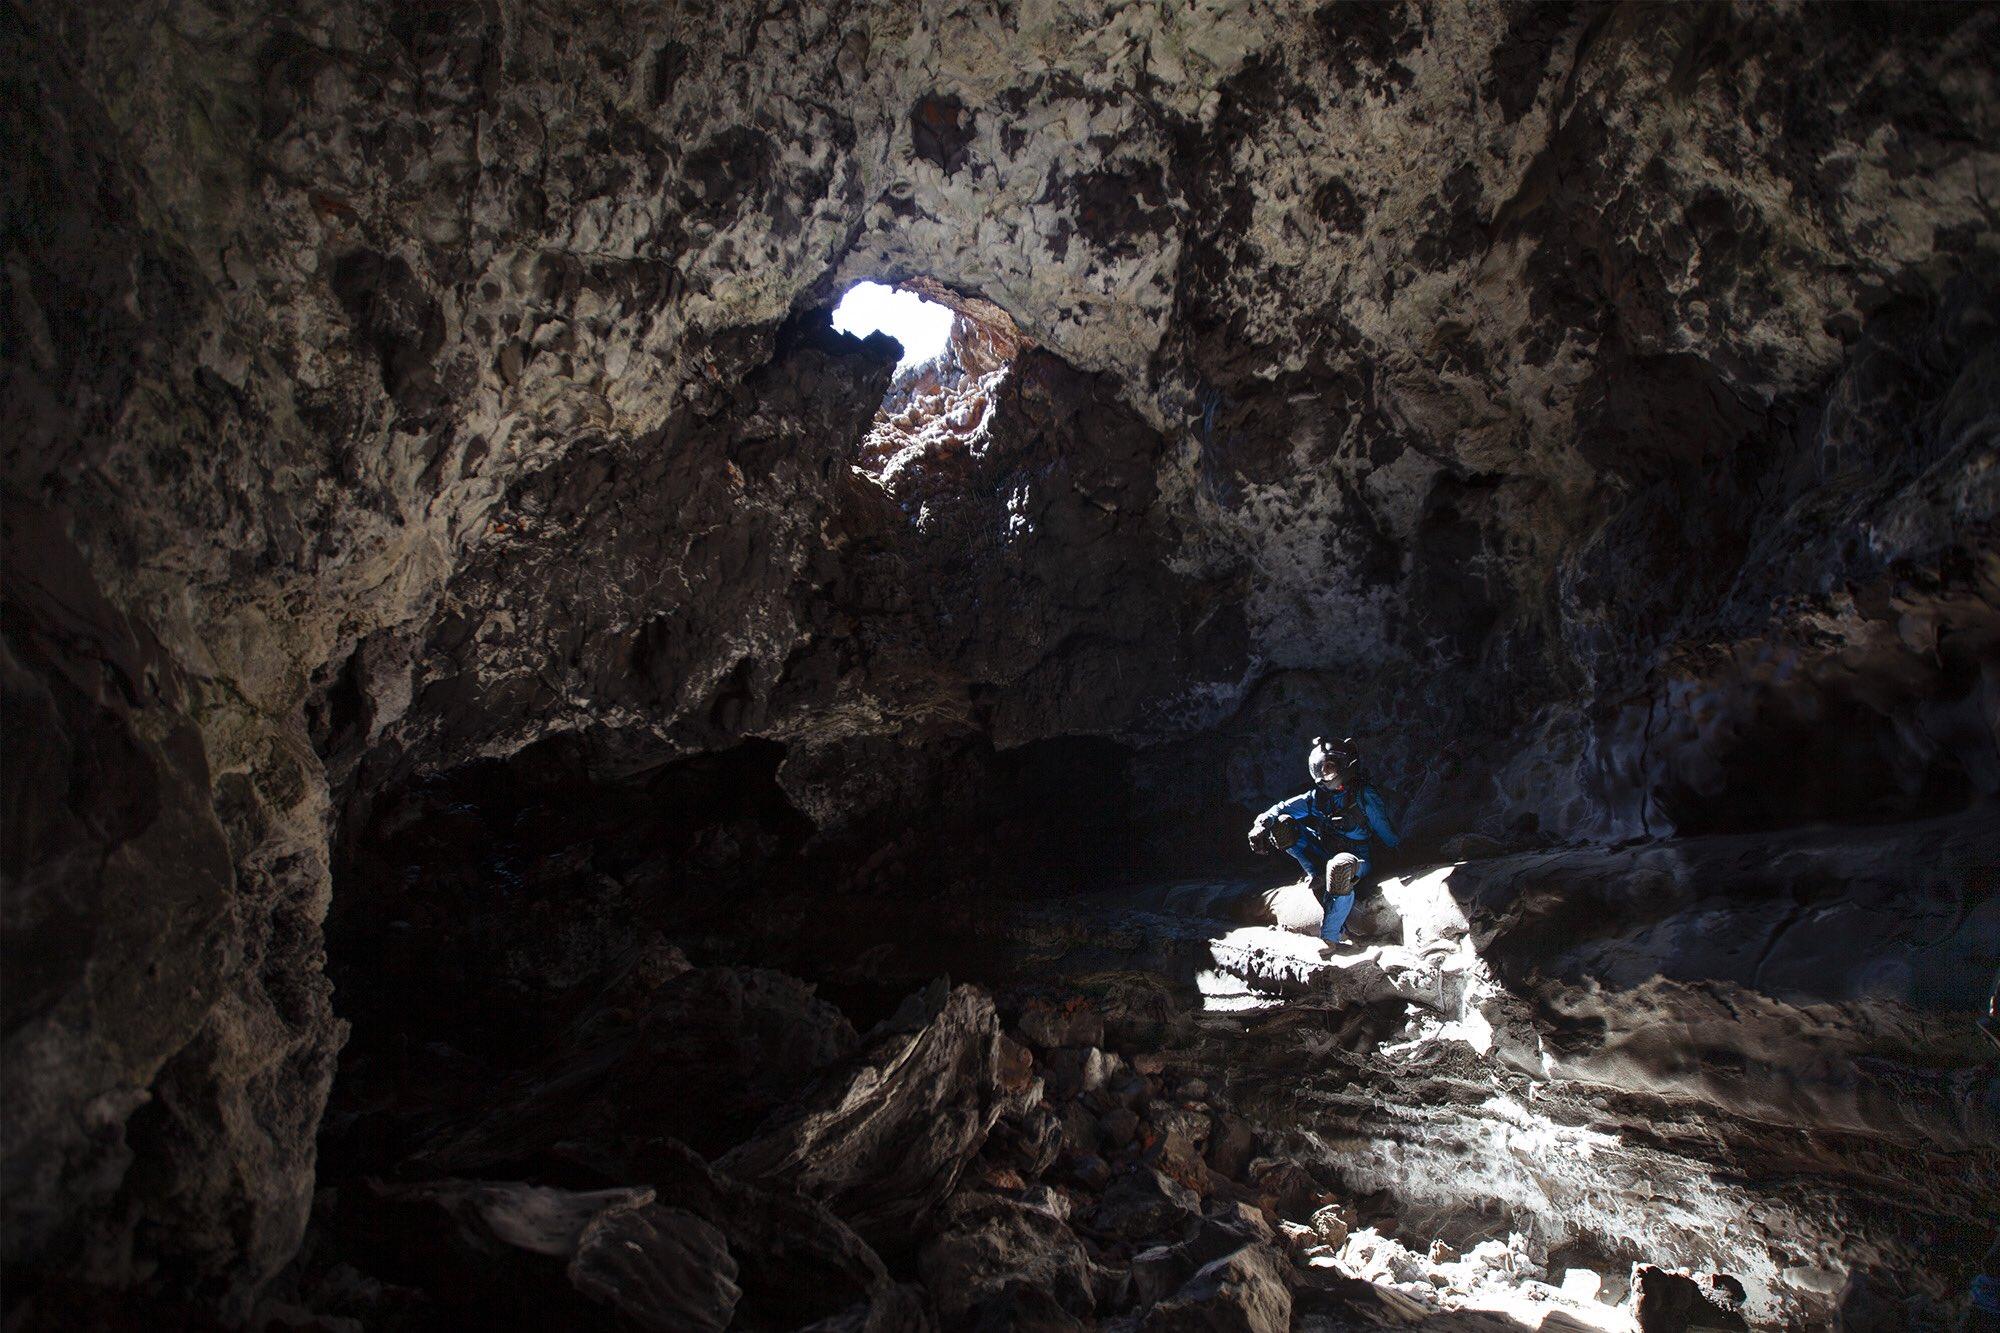 MaryLiz Bender astronaut caver